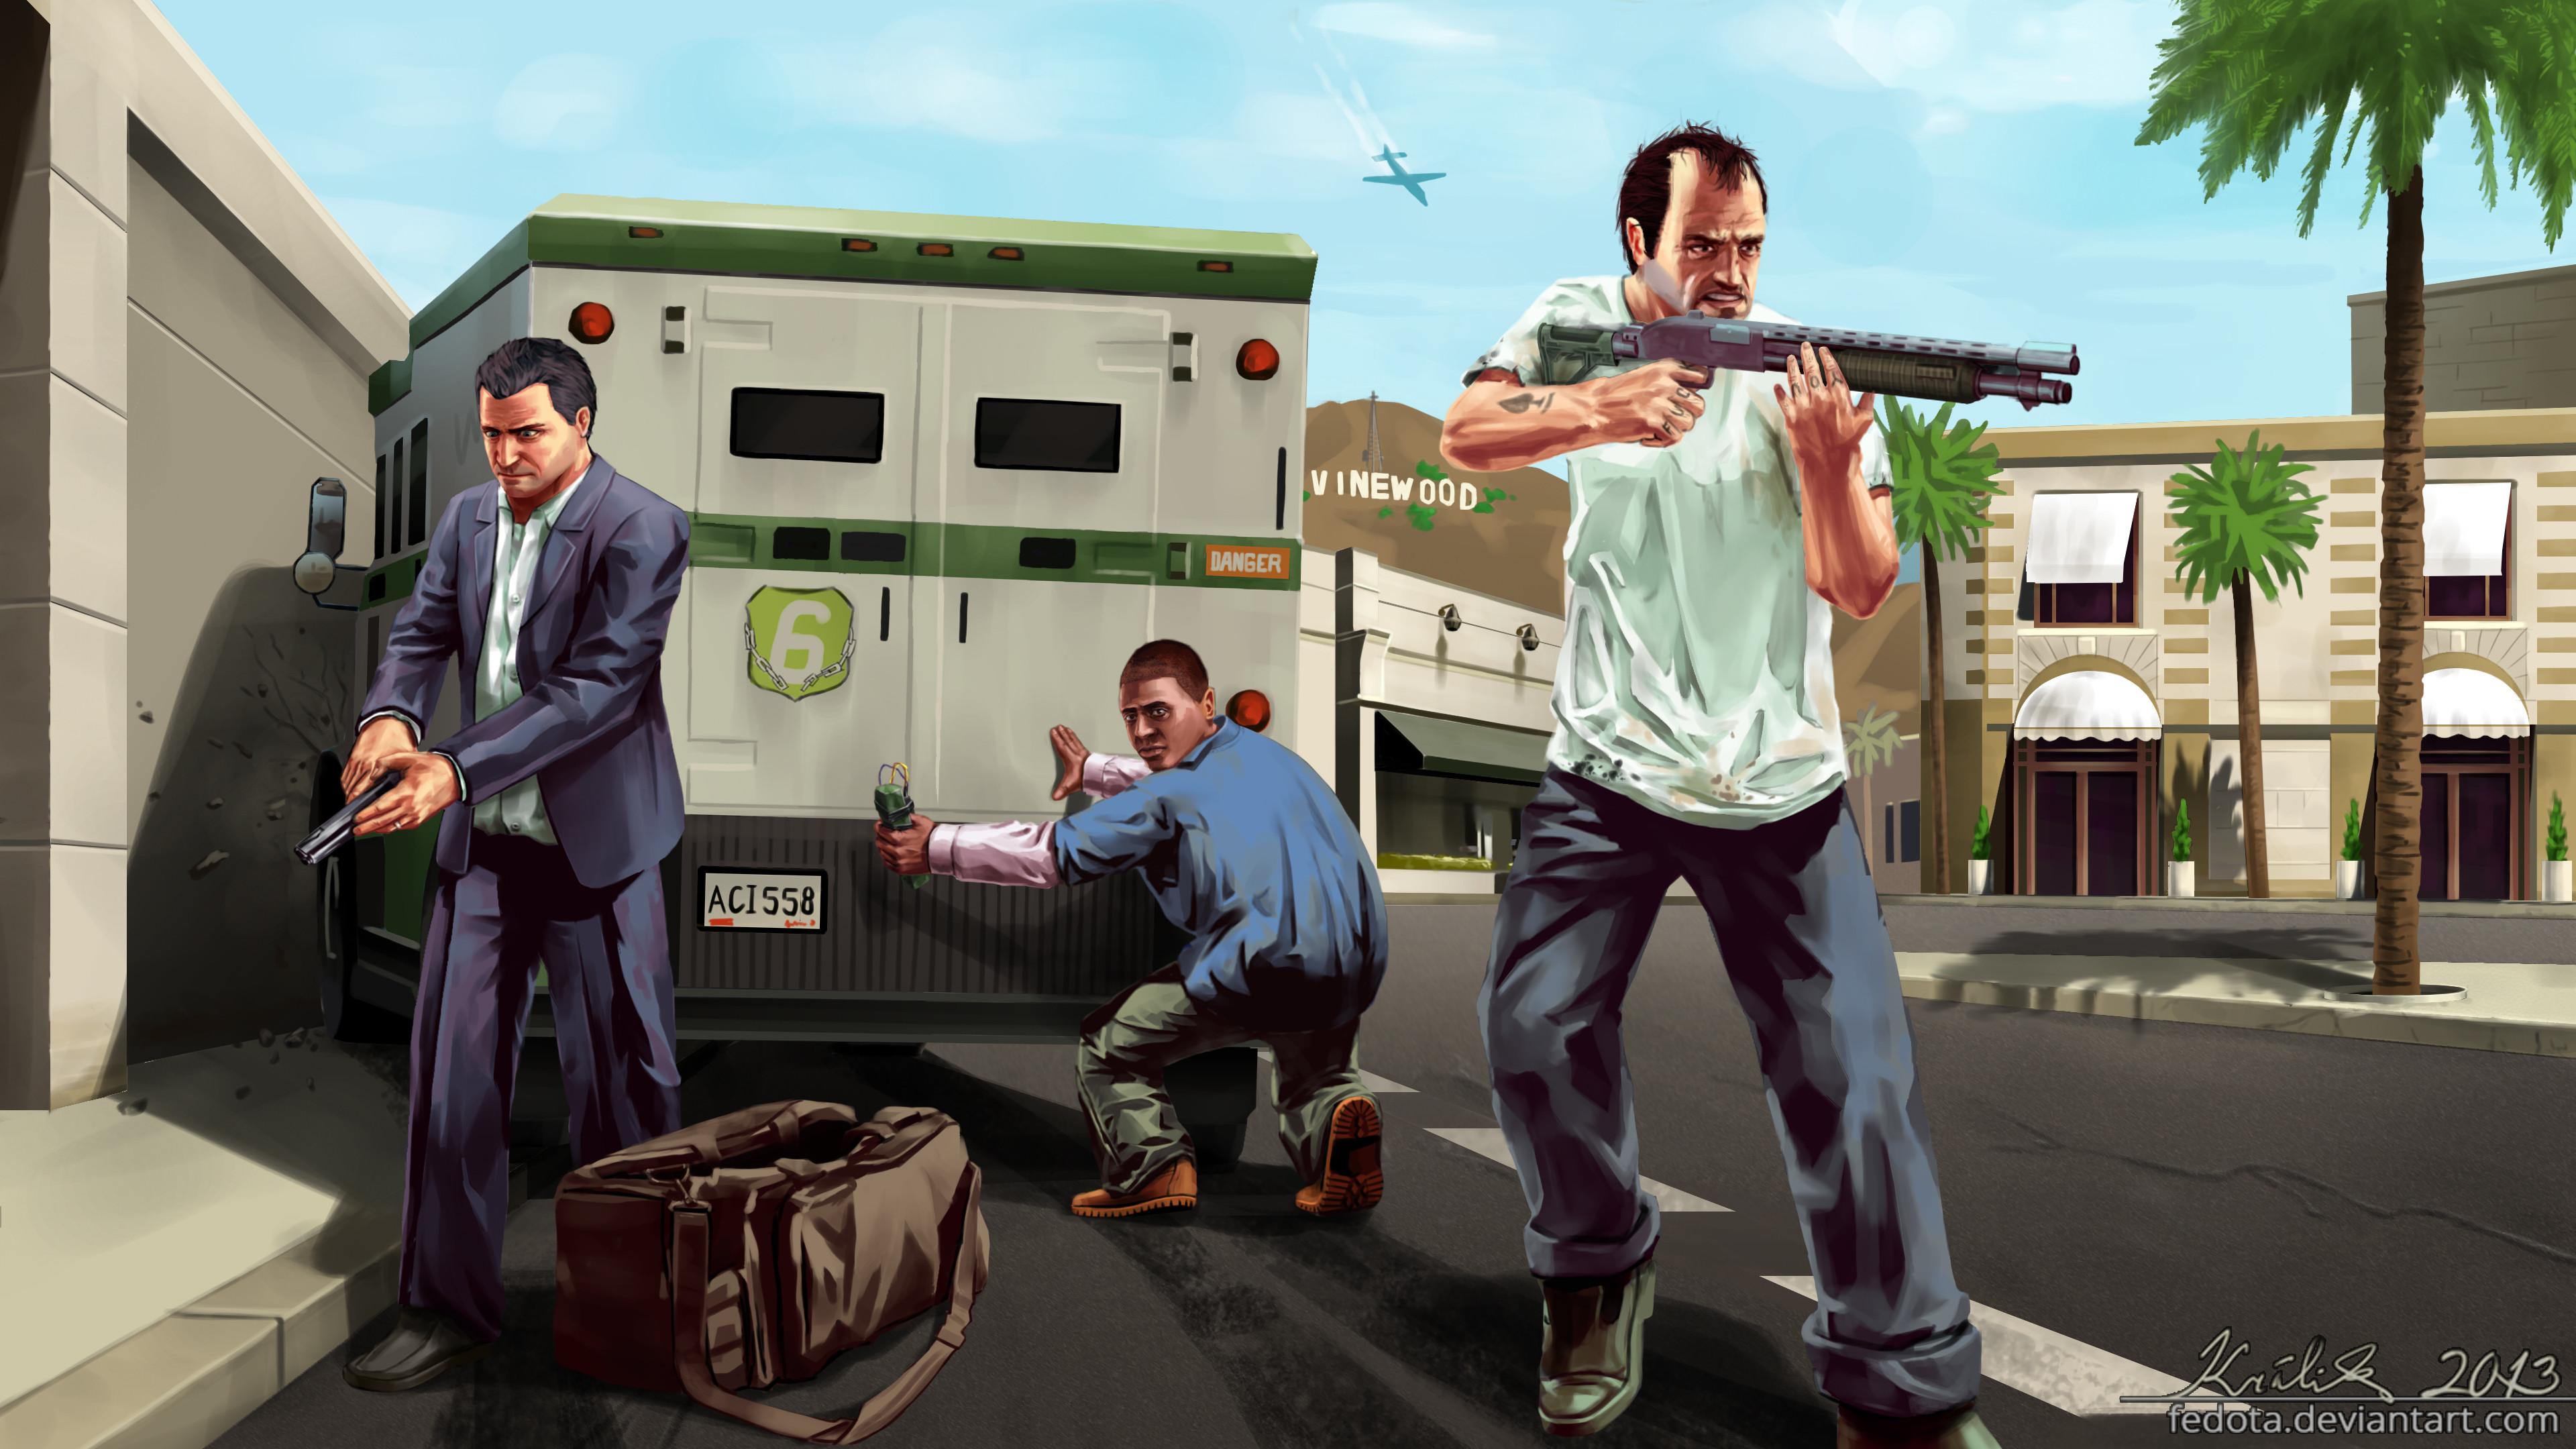 … Grand Theft Auto V 4K by Fedota